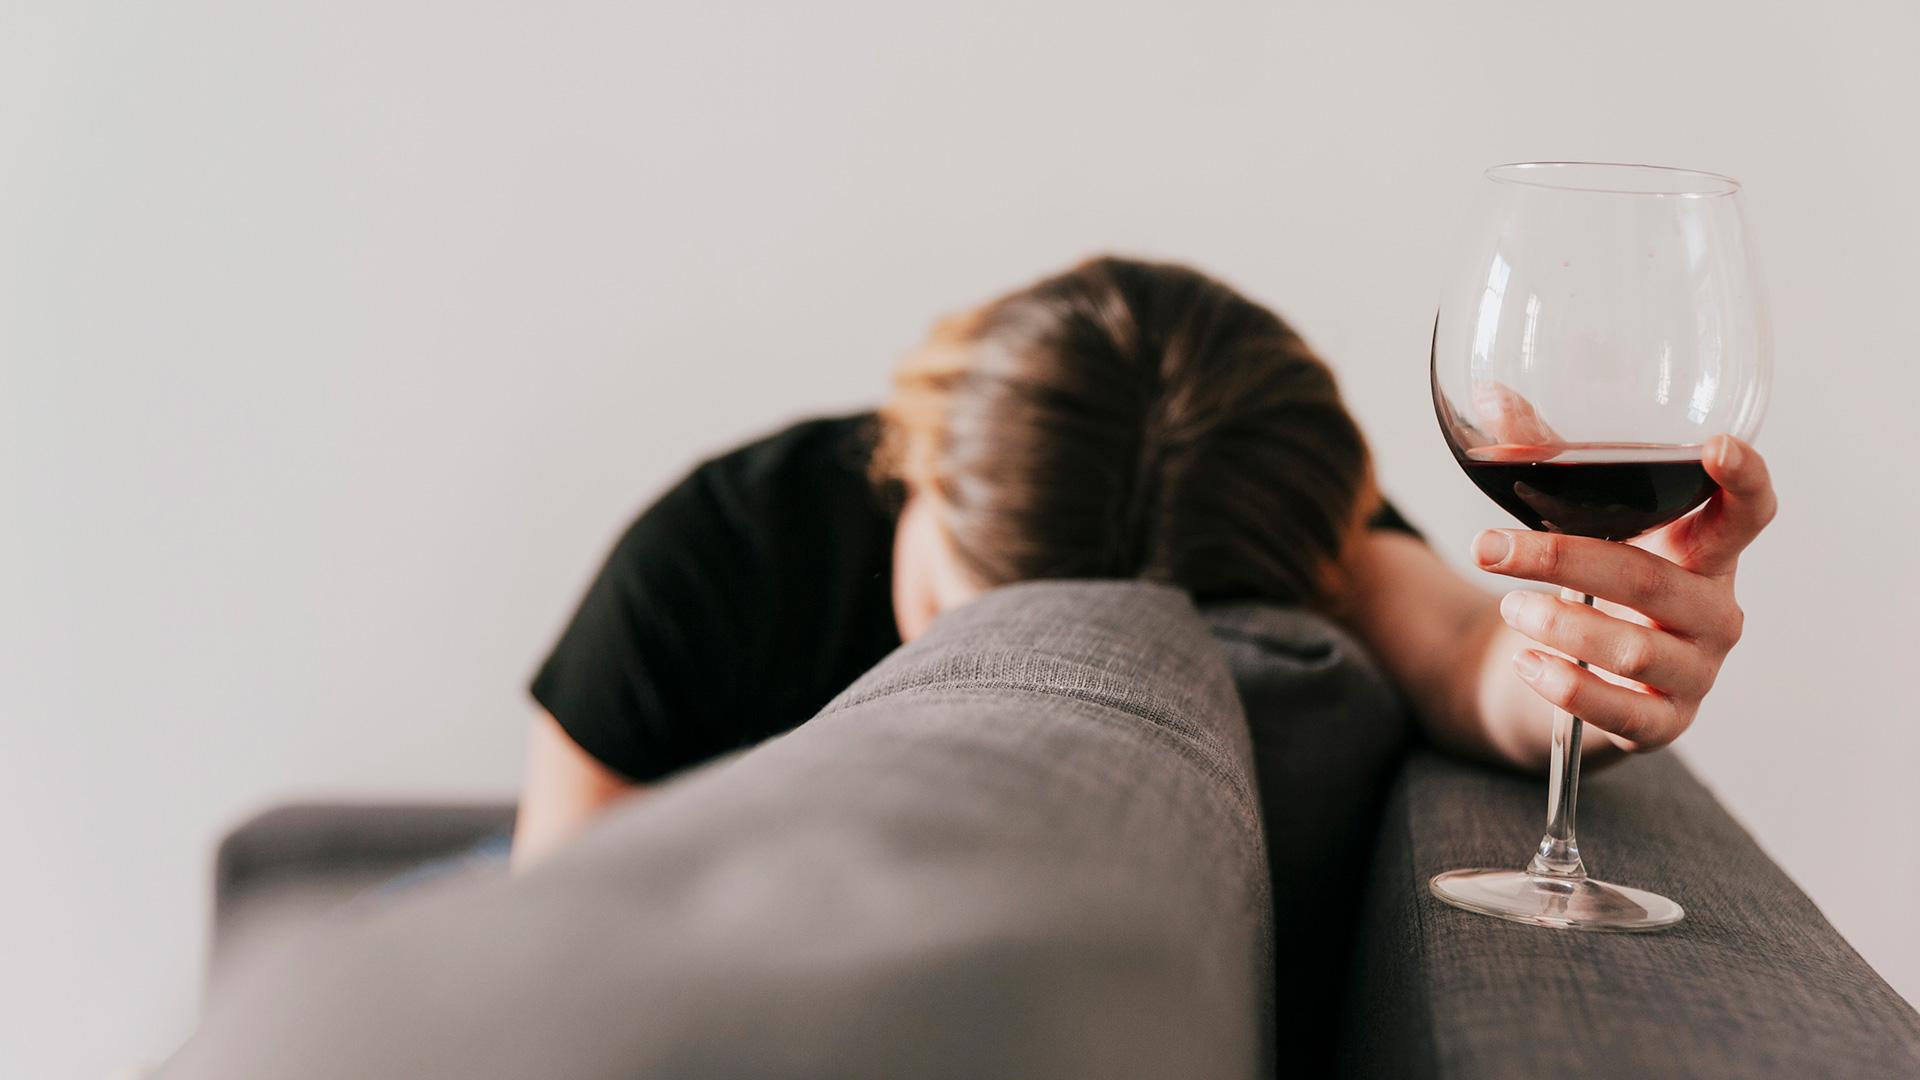 El alcoholismo, o dependencia del alcohol